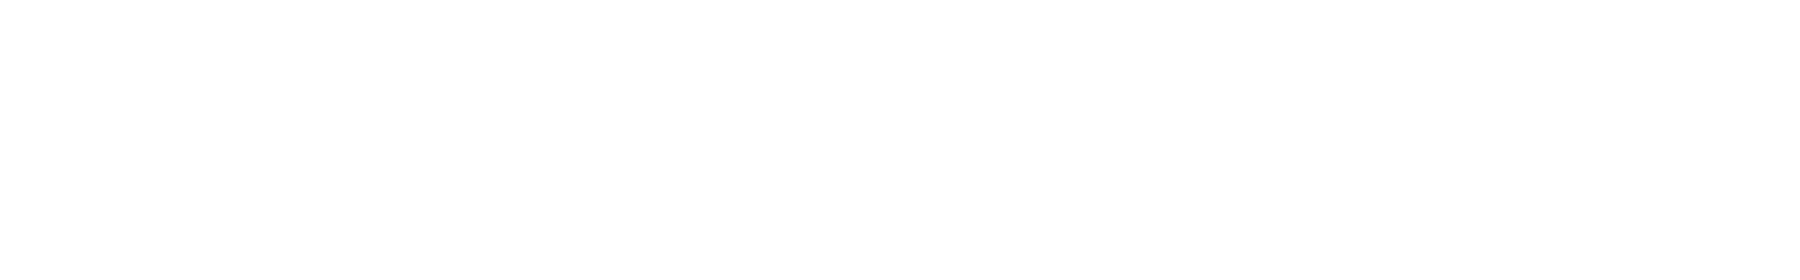 bluezone bc0210 percussion loop 001 110